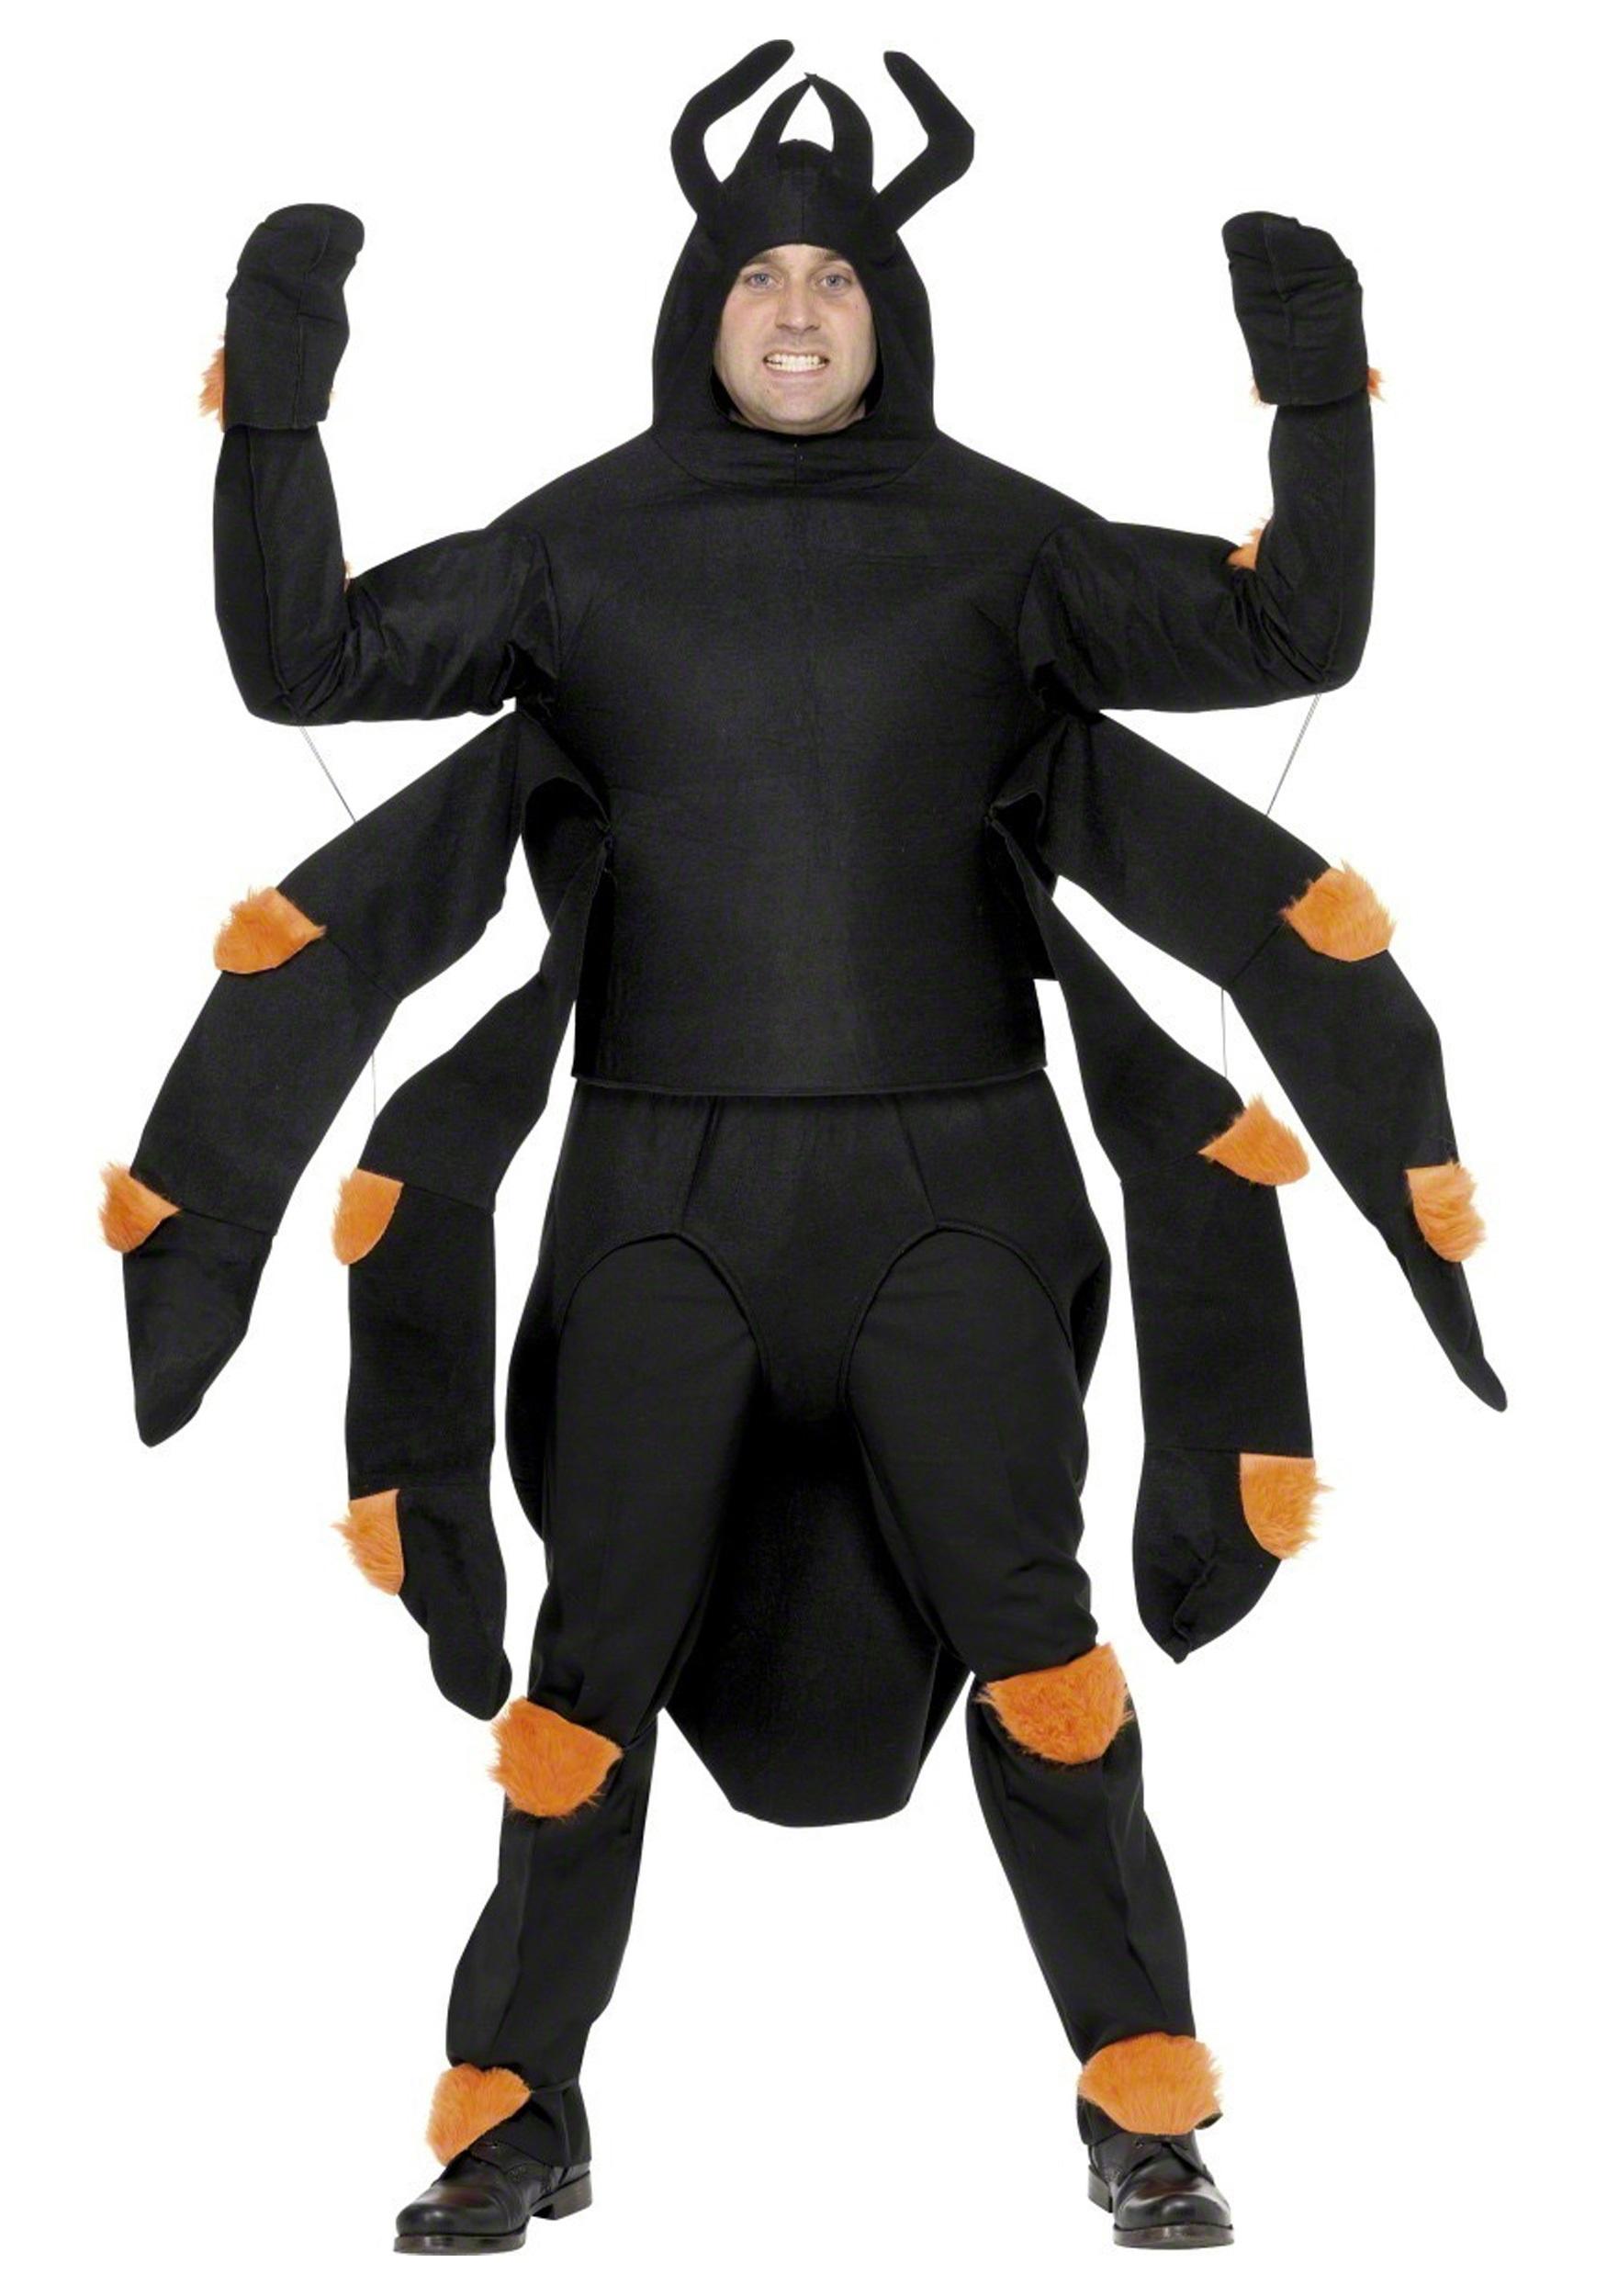 Adult Spider Costume SM36572